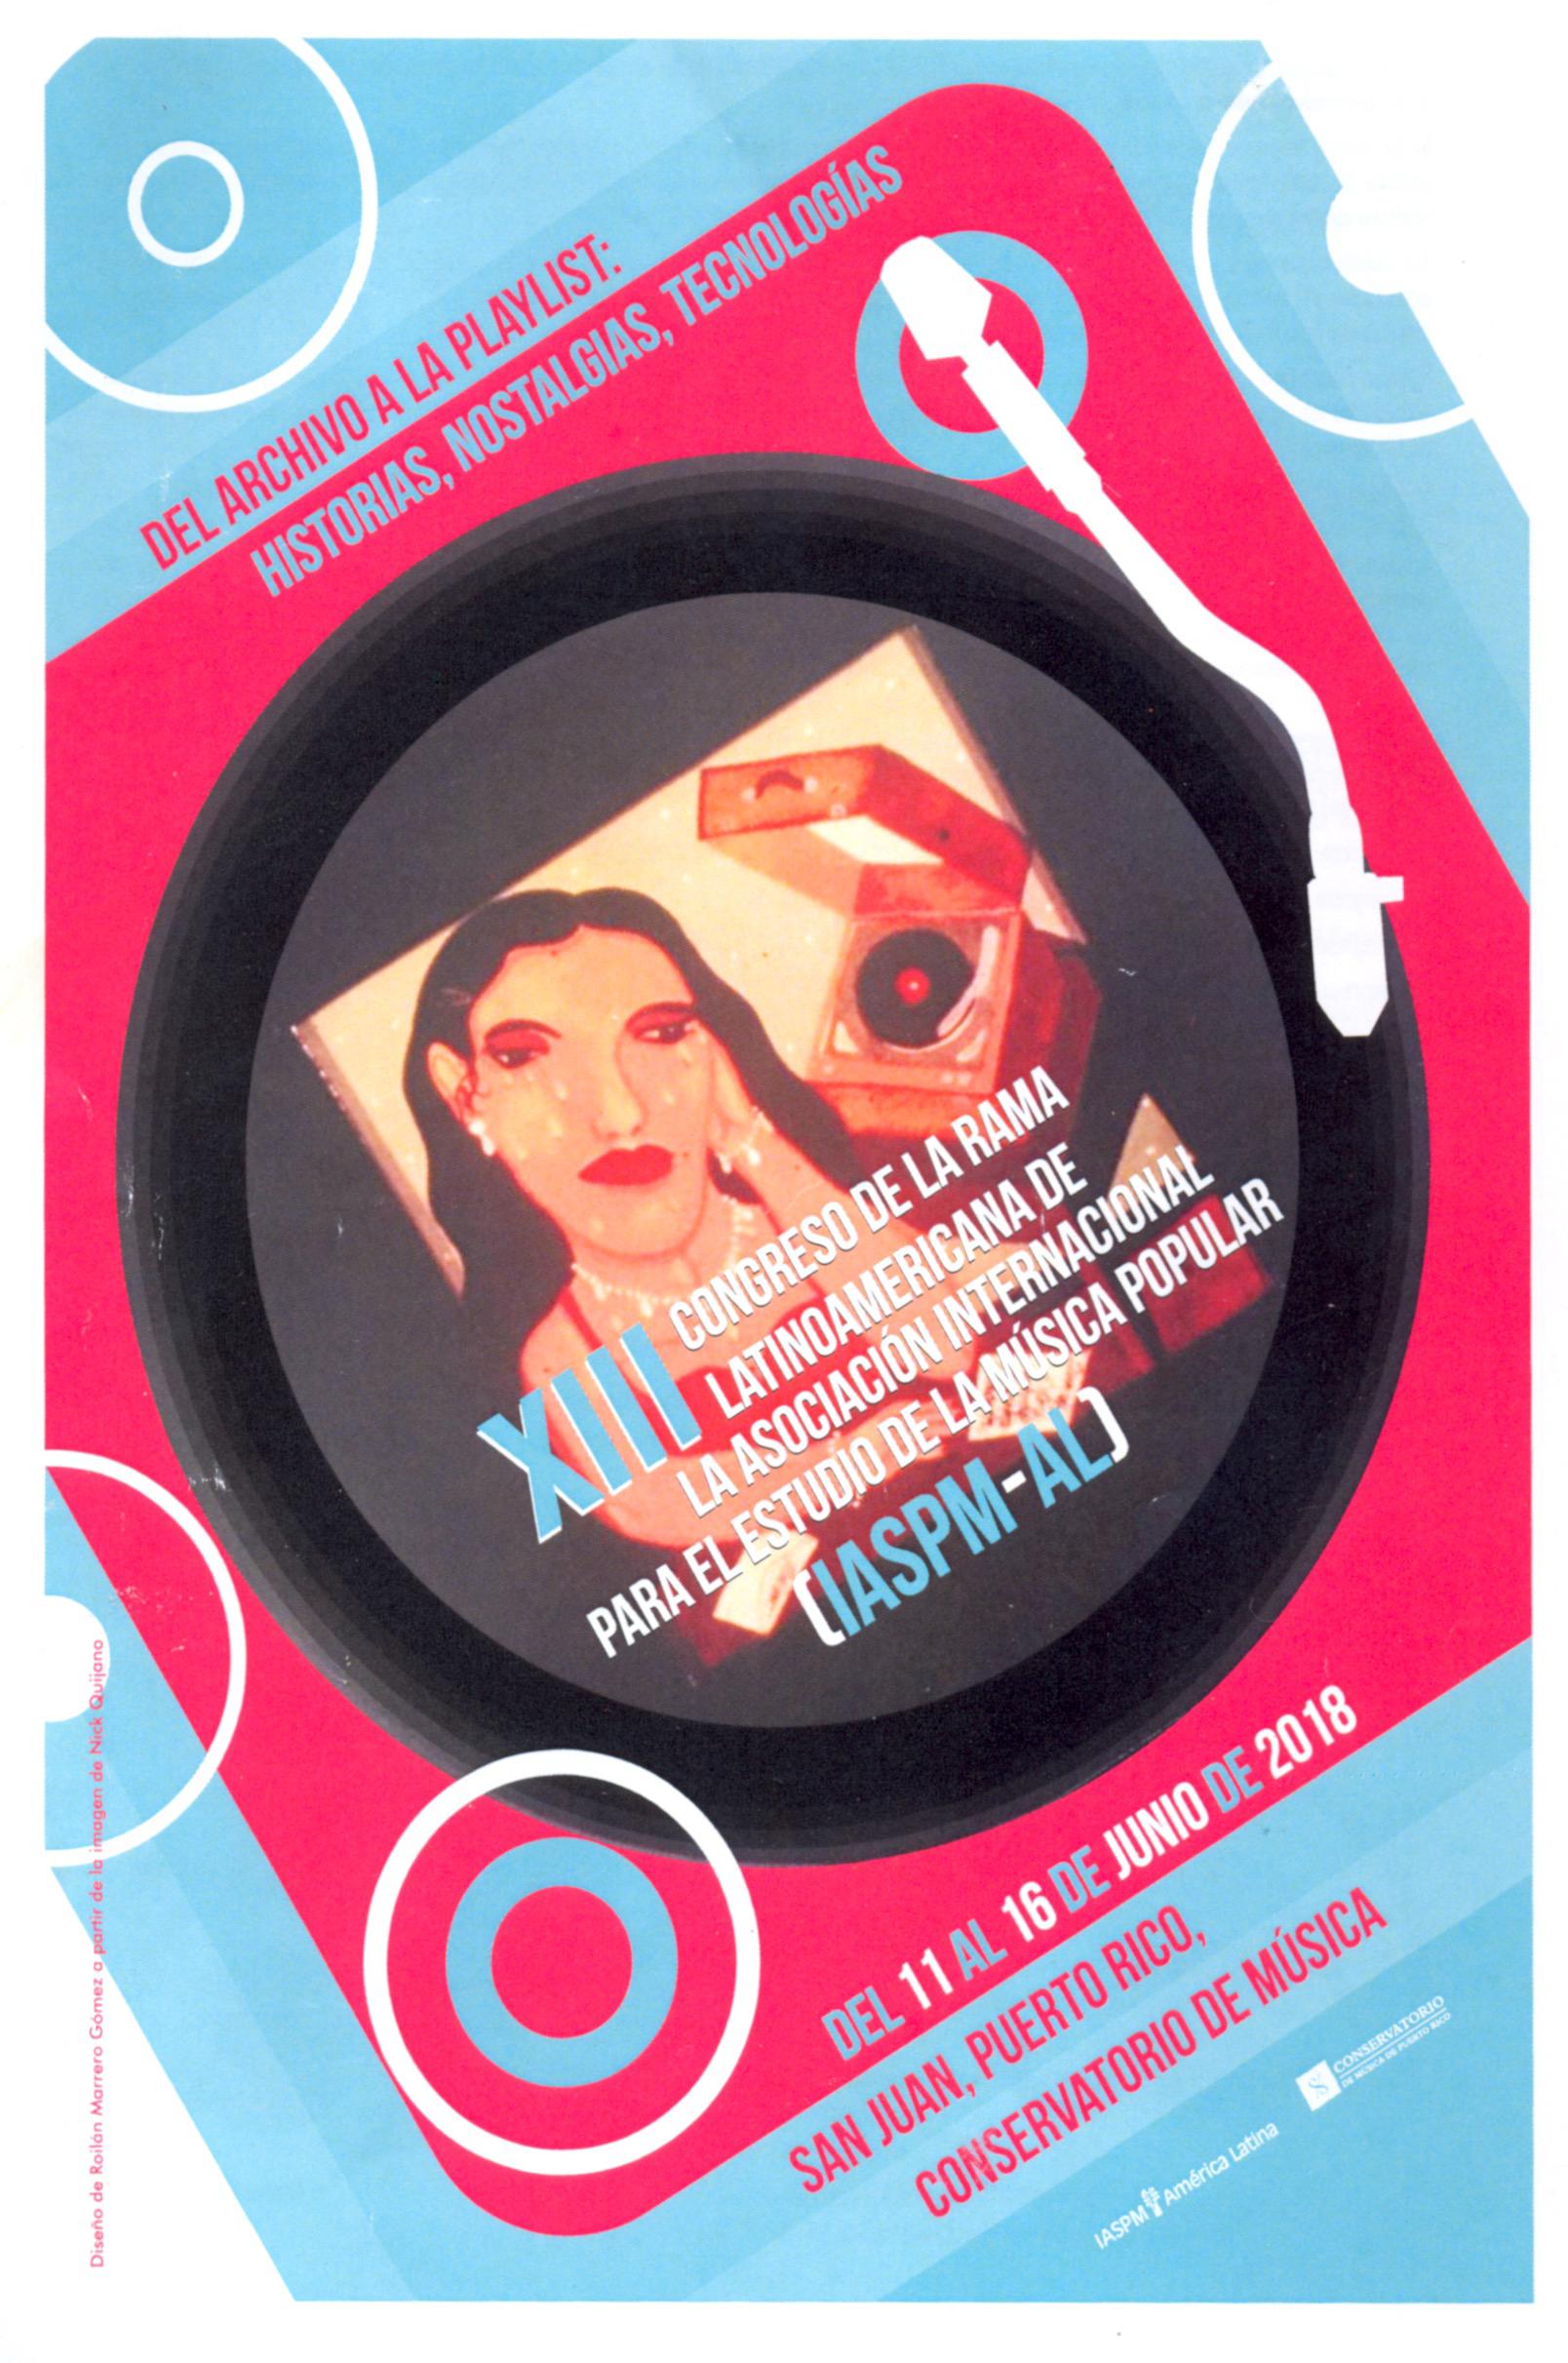 Afiche oficial del XIII Congreso de la IASPM-AL.Diseño de Roilan Marrero Gómez a partir de imagén de Nick Quijano.